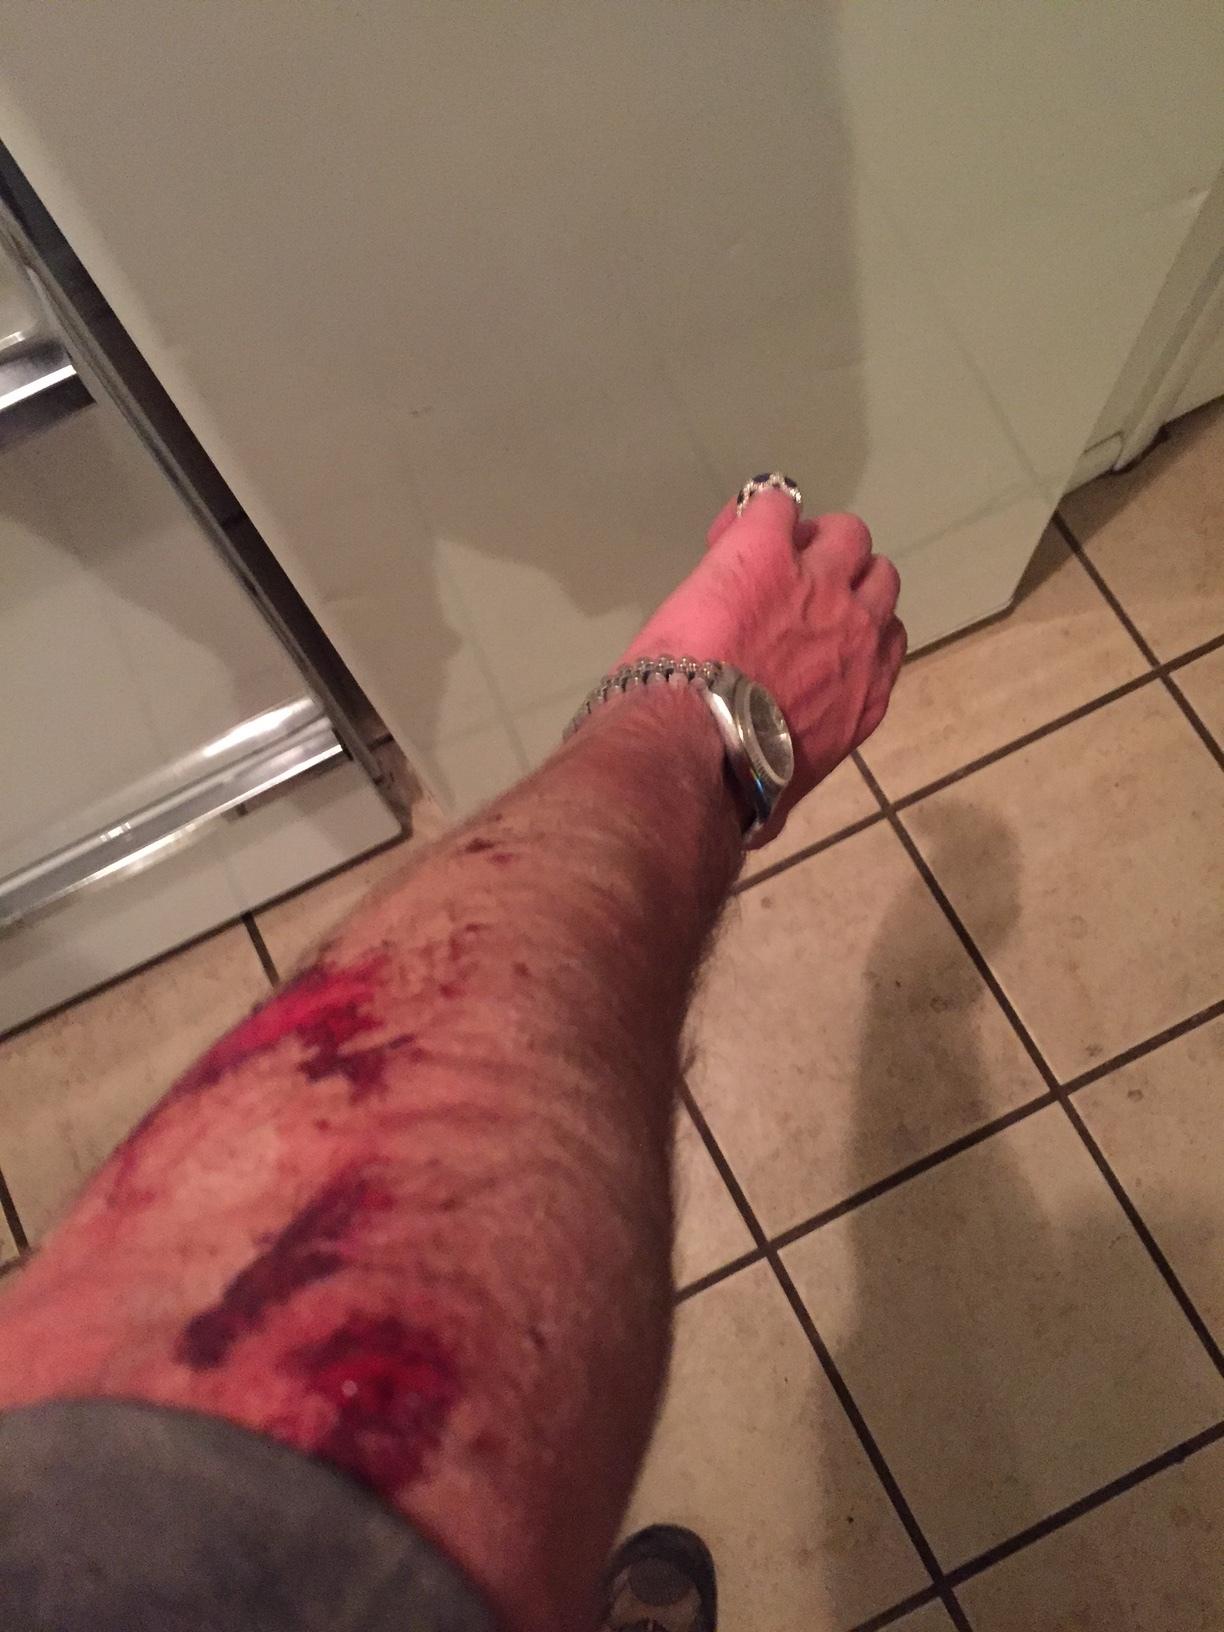 injury2.JPG